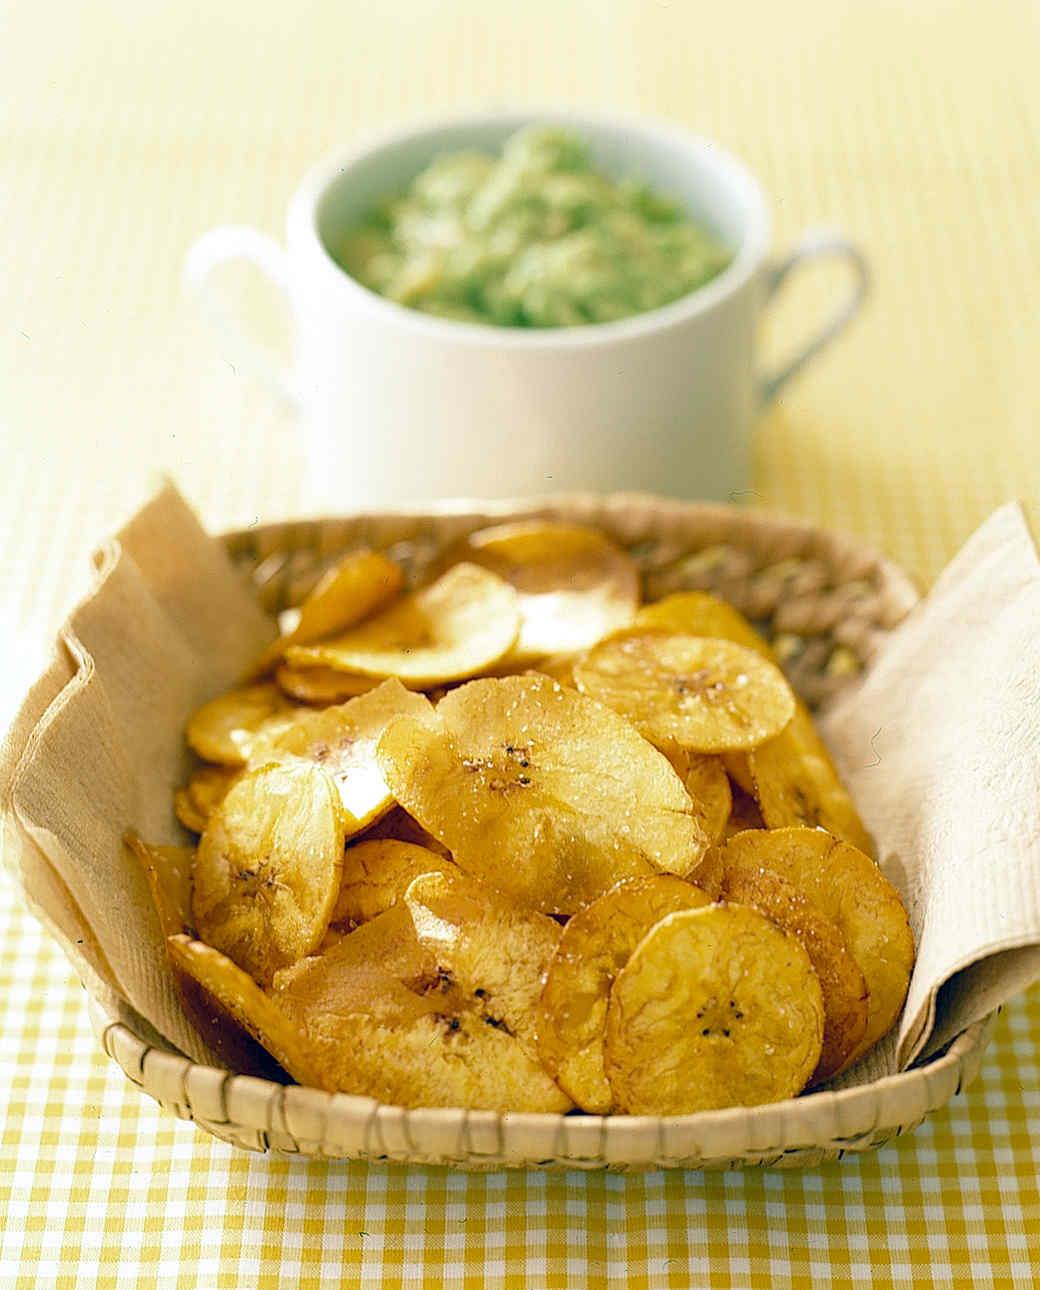 Banana Avocado Dip with Plantain Chips